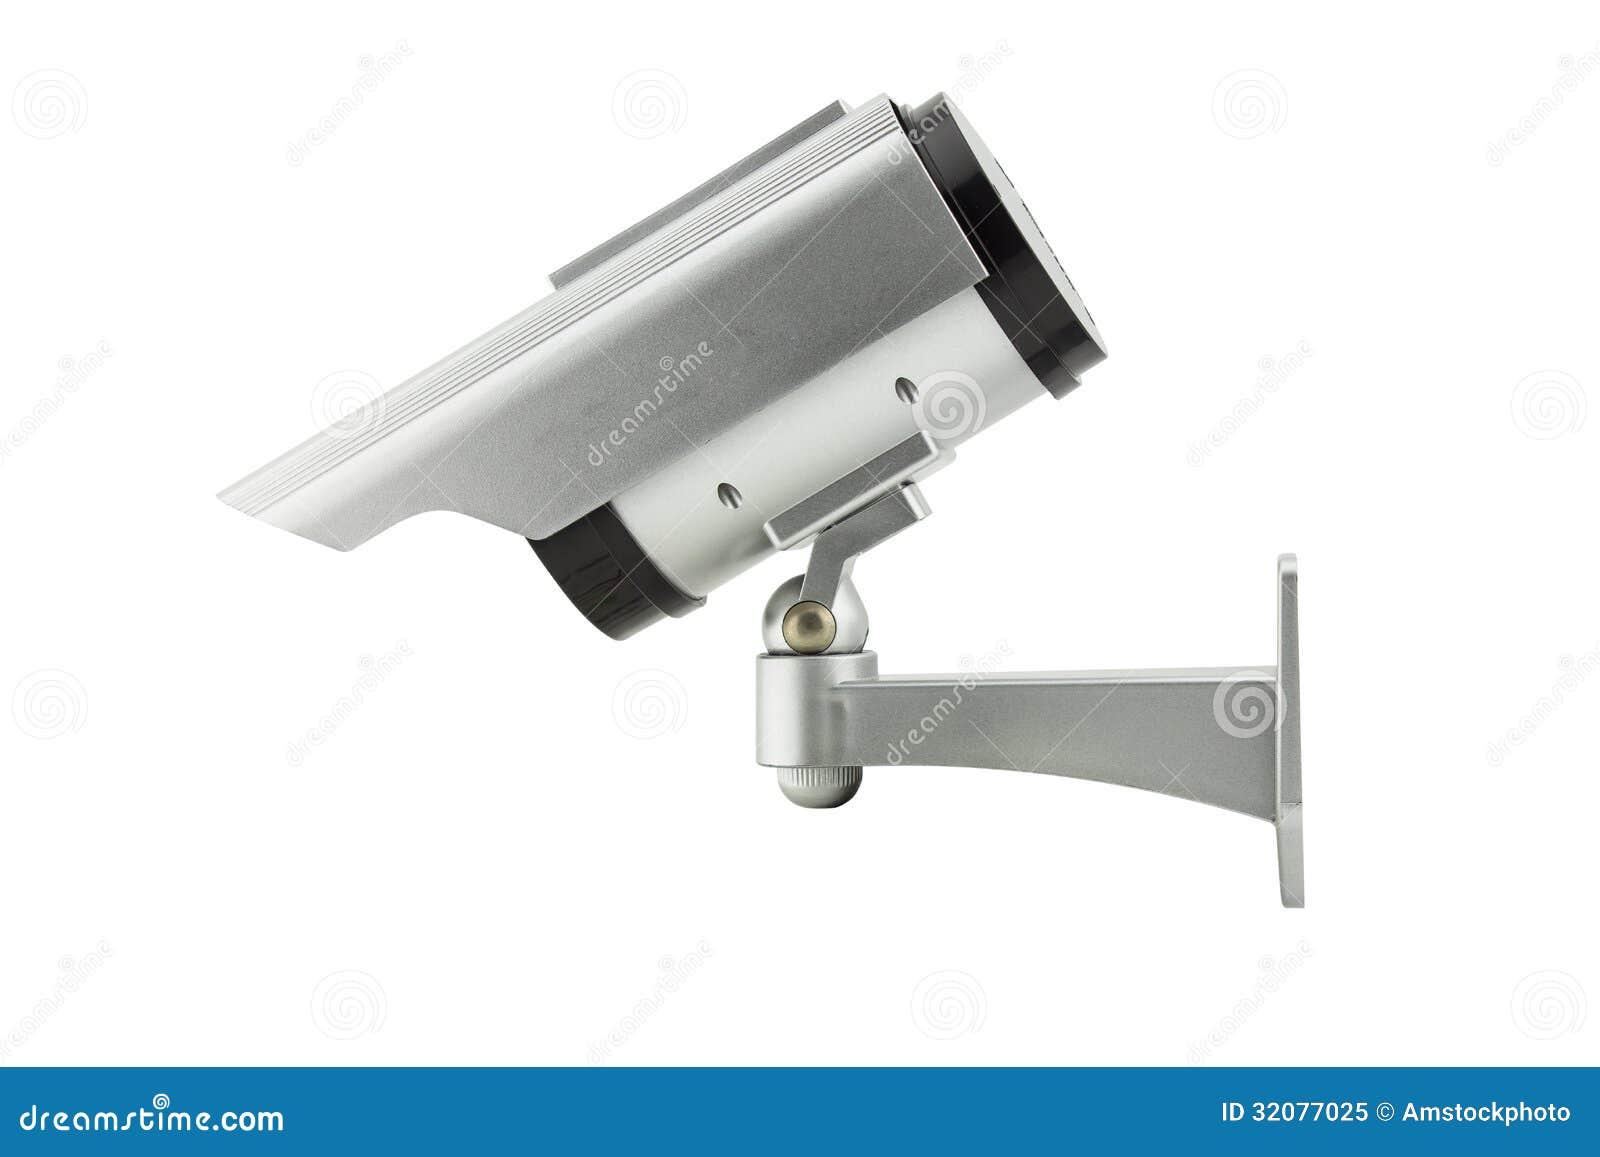 Cctv Camera Isolated On White Background Royalty Free